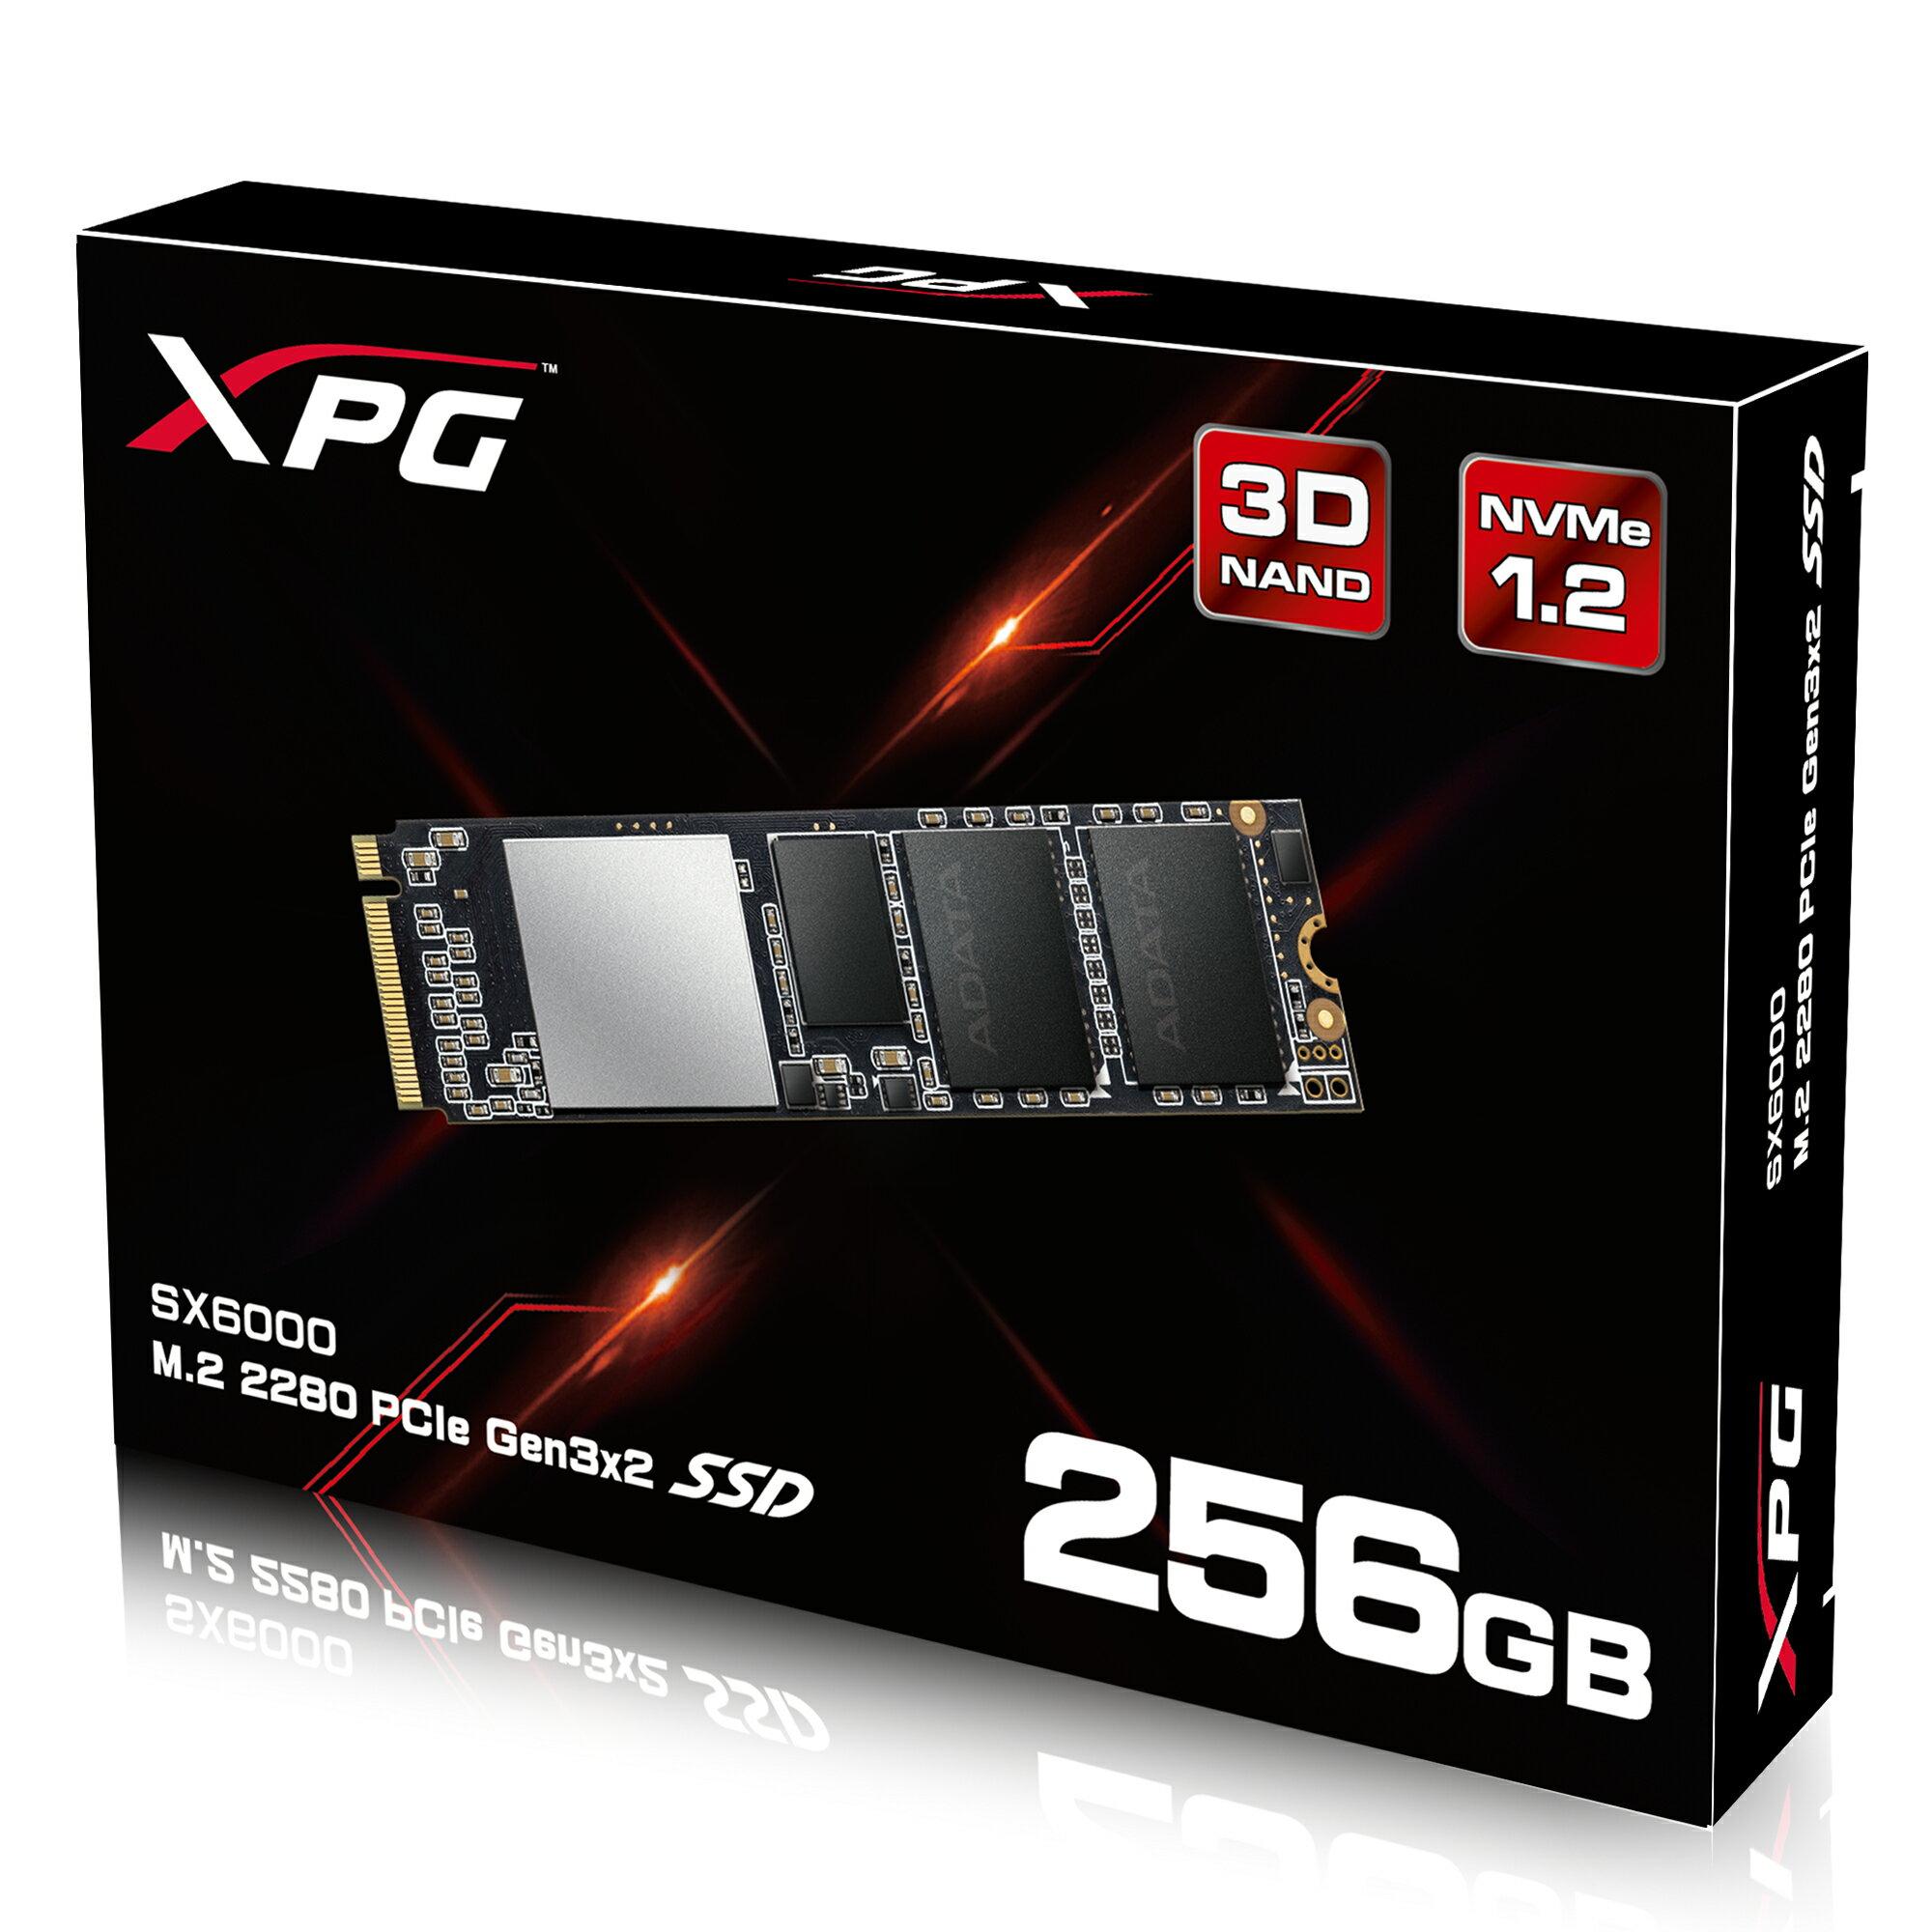 XPG SX6000 PCIe Gen3x2 M.2 2280 256GB SSD by ADATA with DIY XPG Heatsink 0